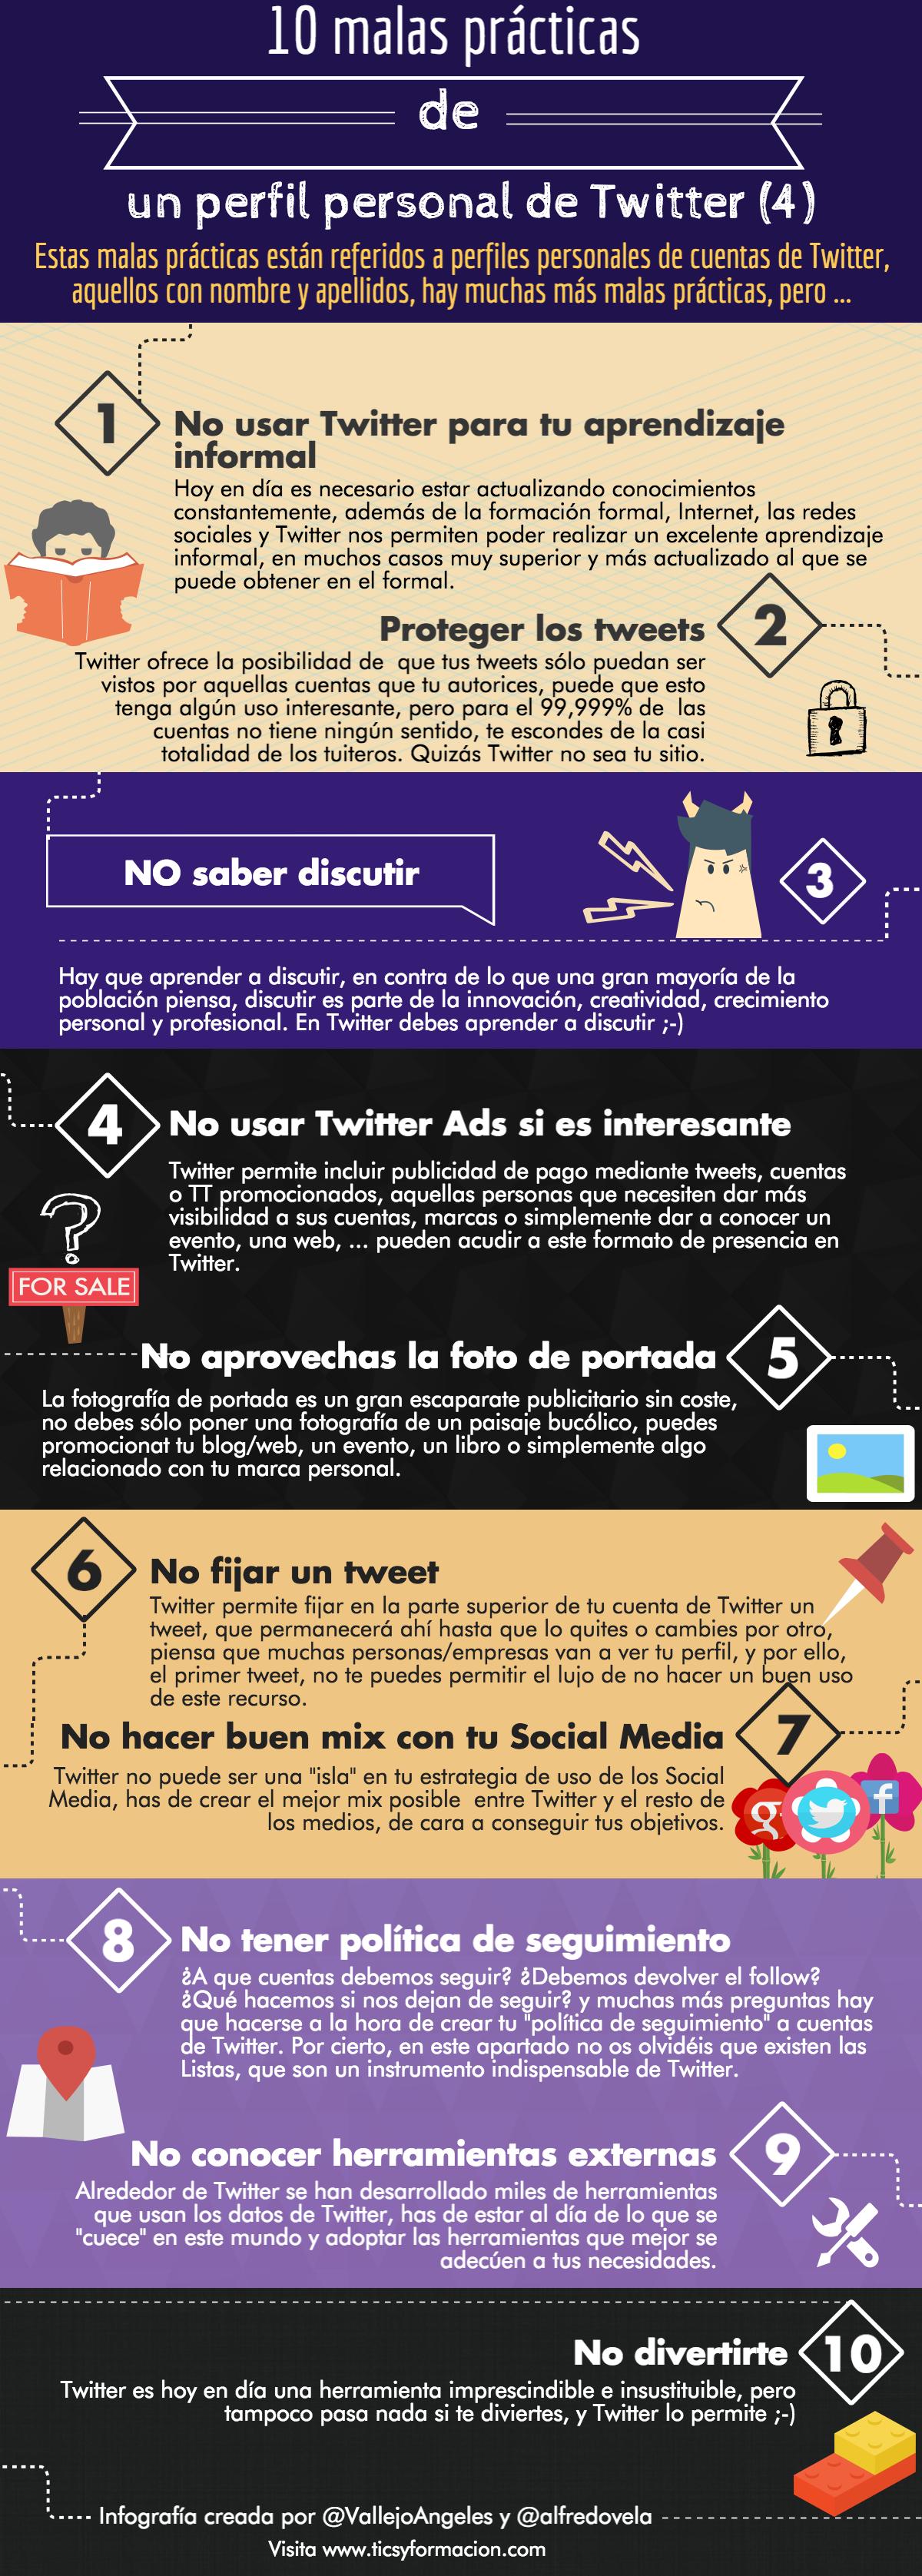 10 malas prácticas en un perfil personal de Twitter (IV)